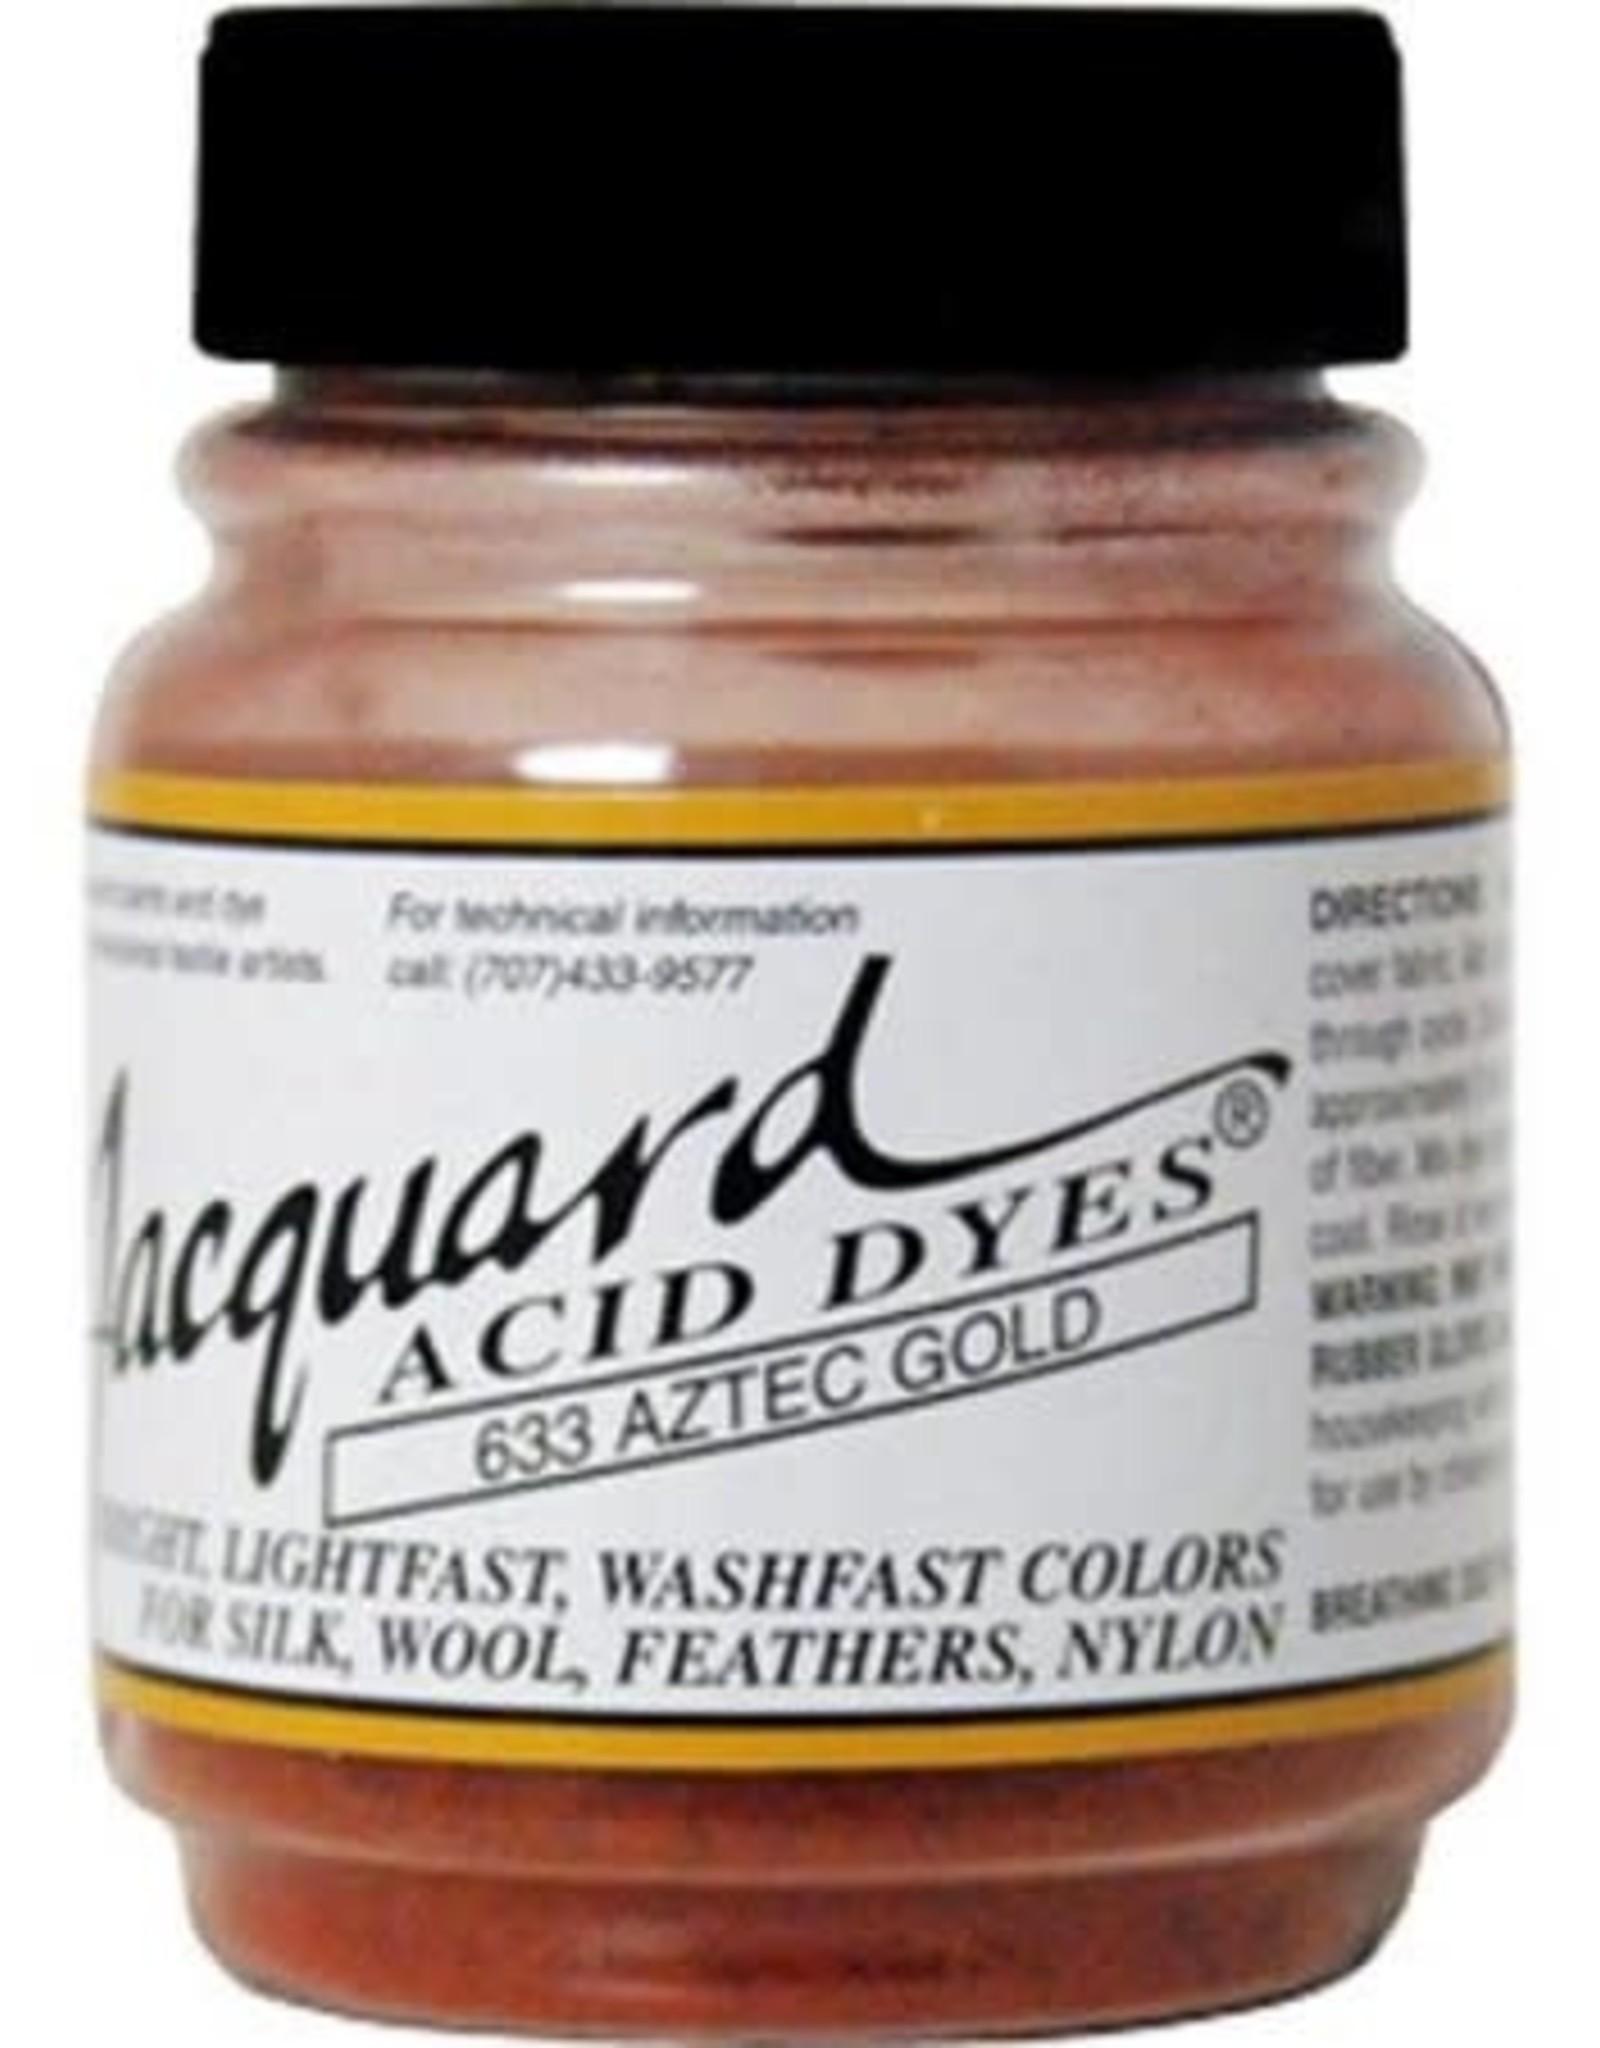 Jacquard Jacquard Acid Dye Aztec Gold